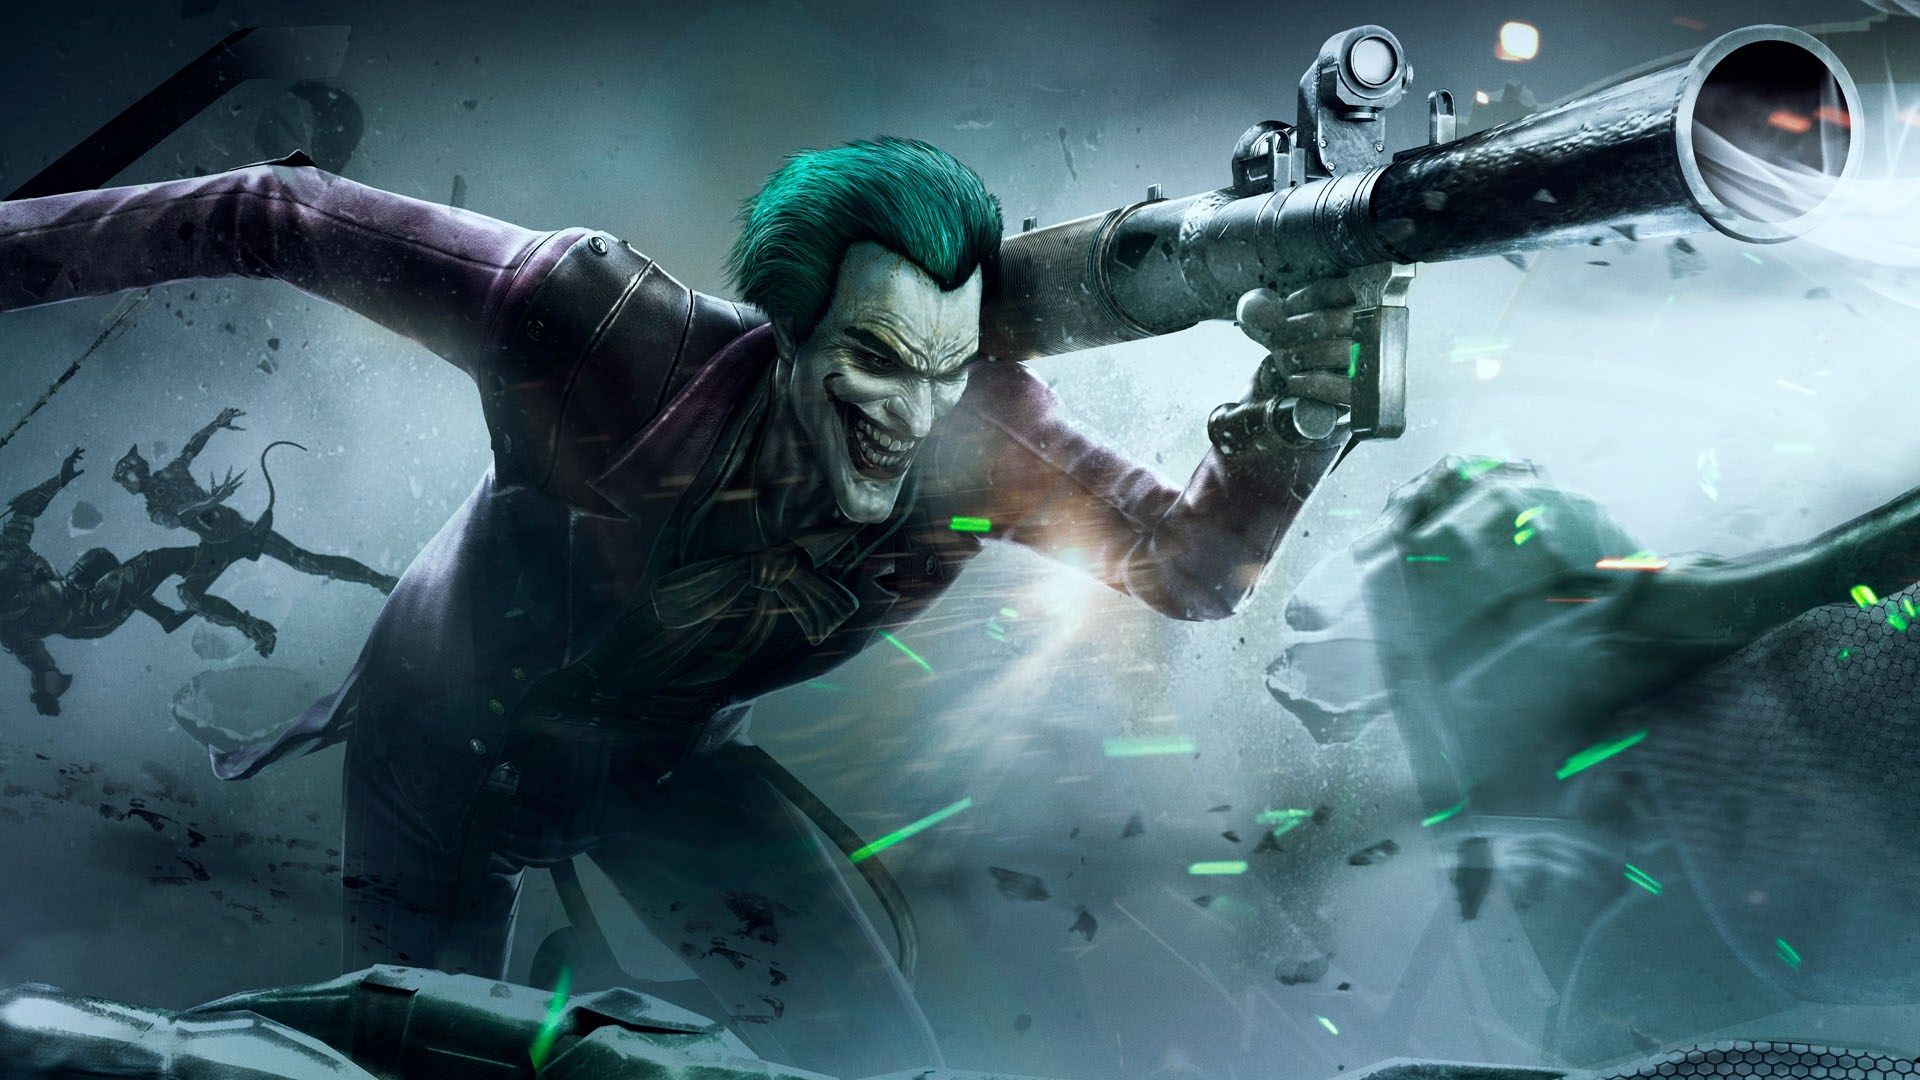 Wallpapers For Desktop Injustice Gods Among Us Wallpaper By Indiana Leapman 2016 09 28 Joker Wallpapers Joker Joker And Harley